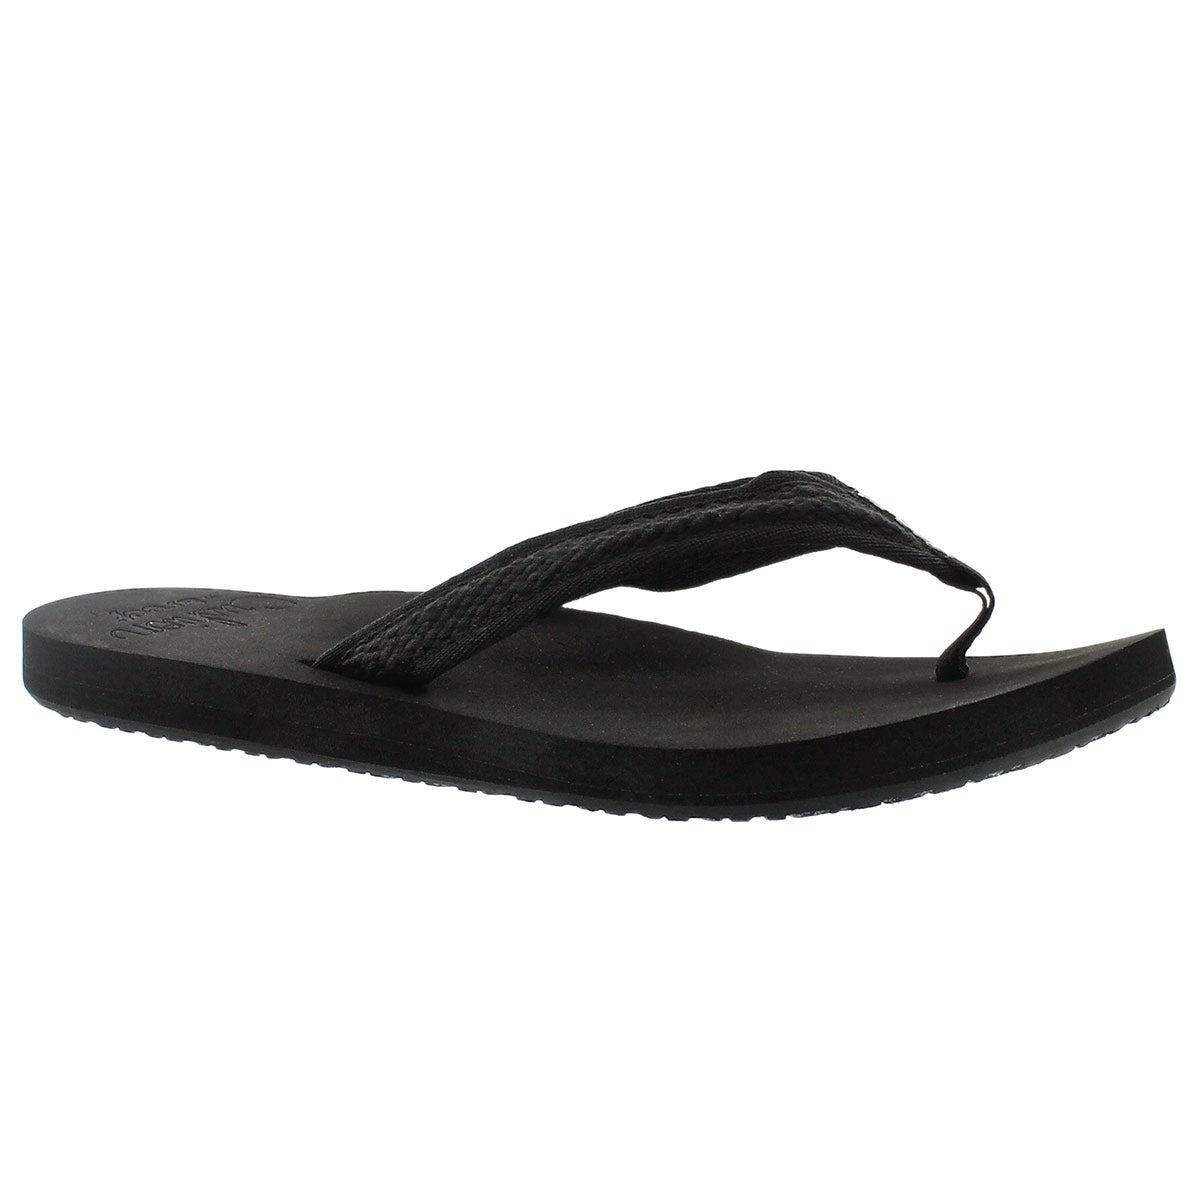 Sandale tong Braided Cushion, noir, femm